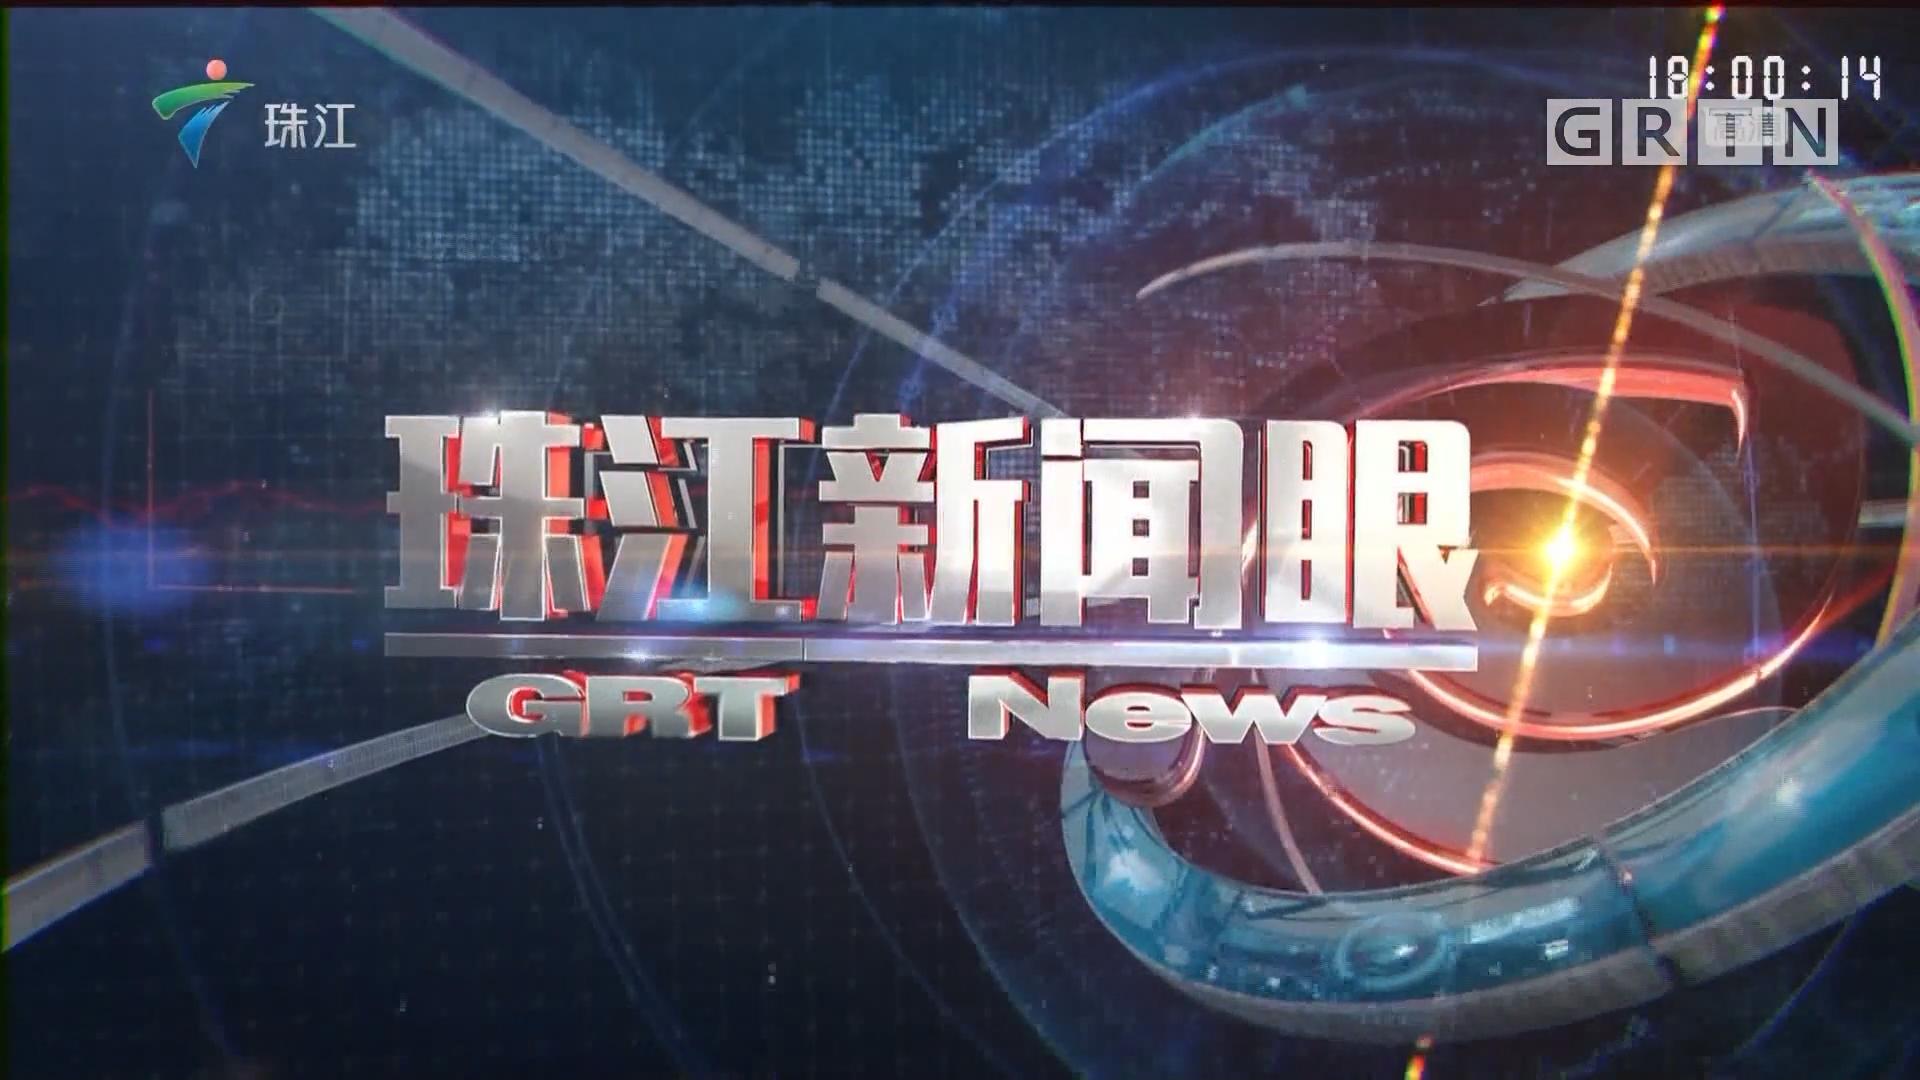 [HD][2019-01-11]珠江新闻眼:春运坐飞机出行 部分航线仍有折扣